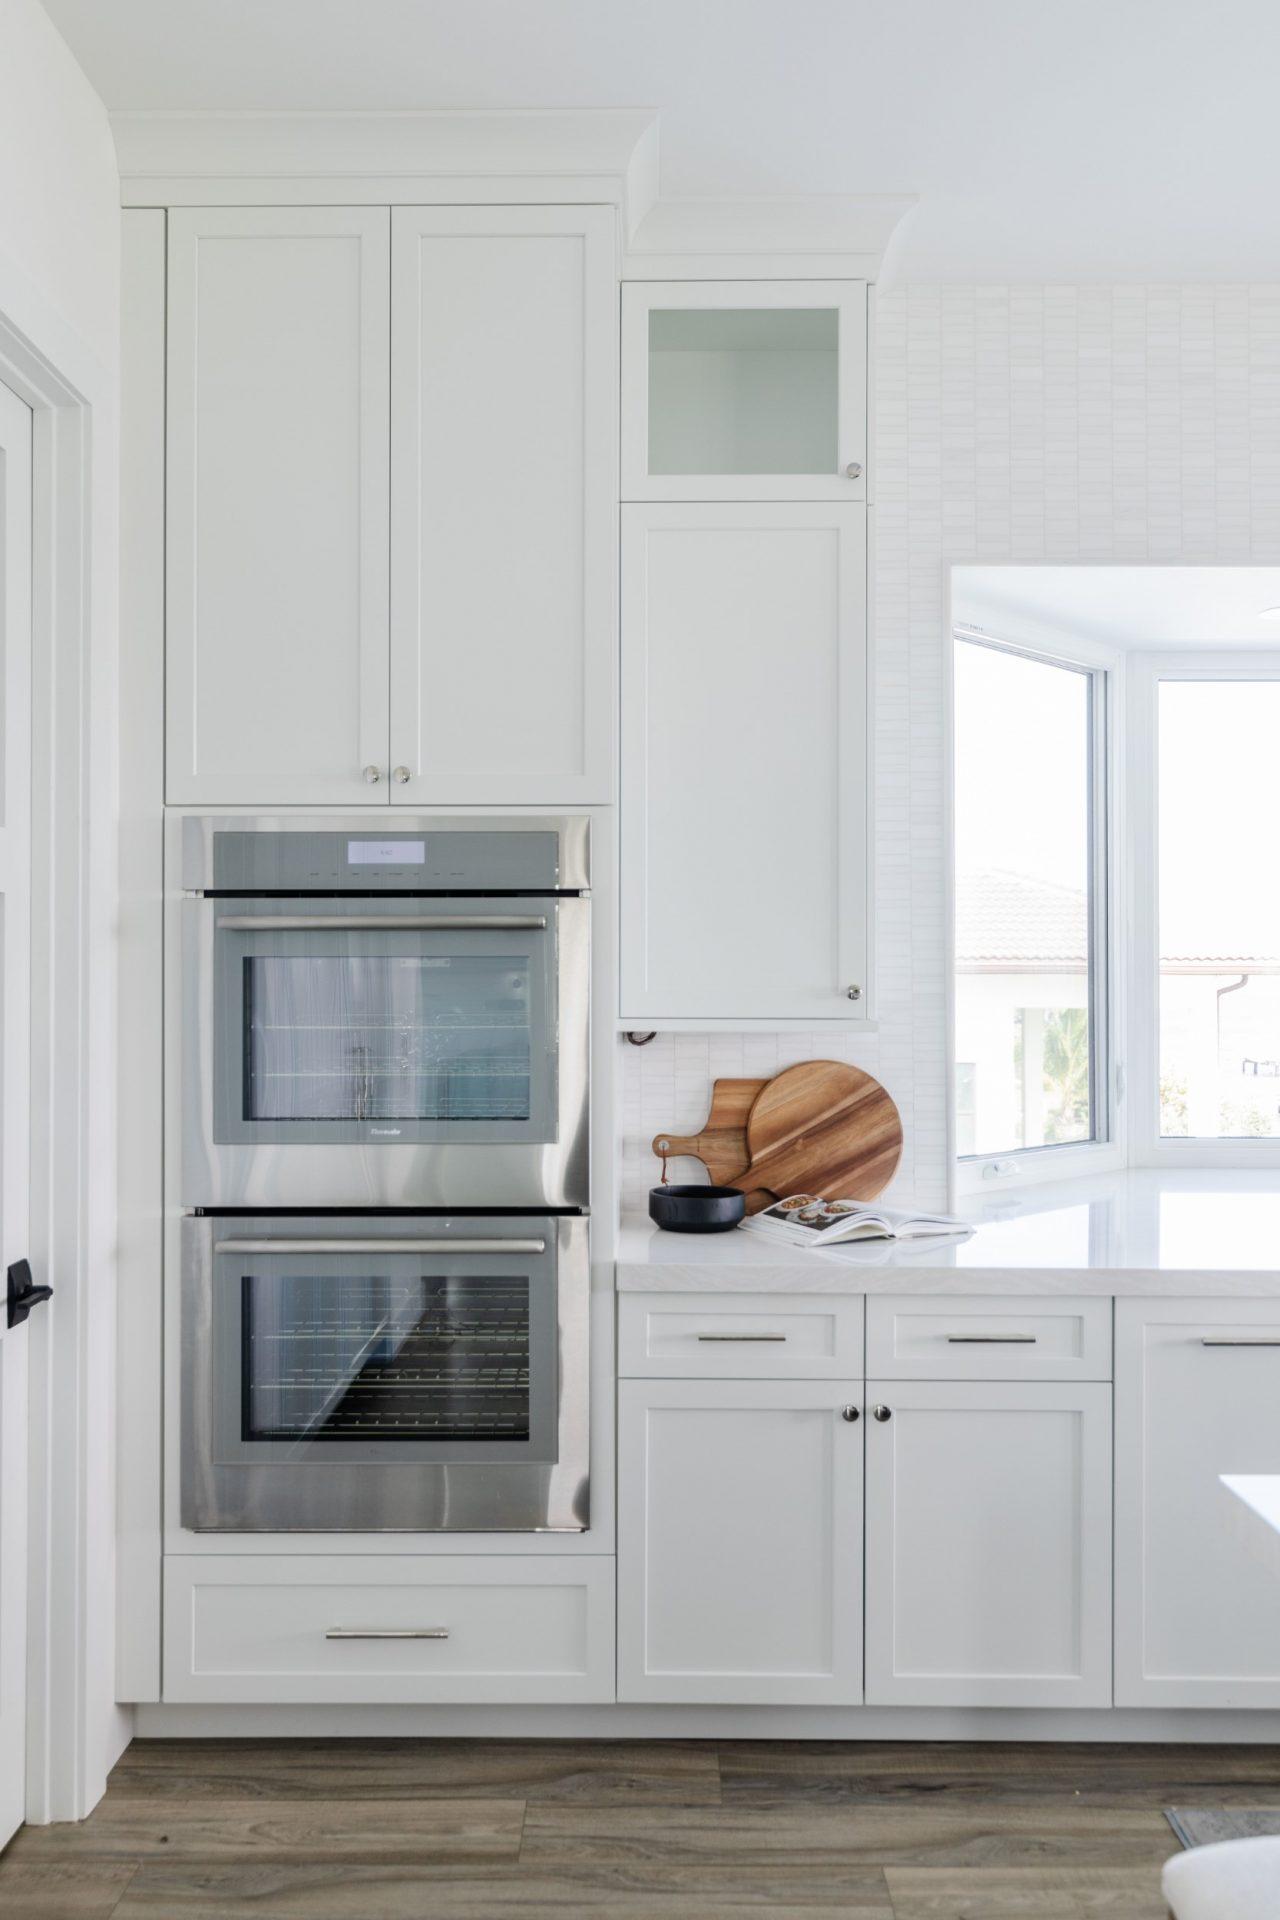 Peet's Perch | Kitchen Double Oven